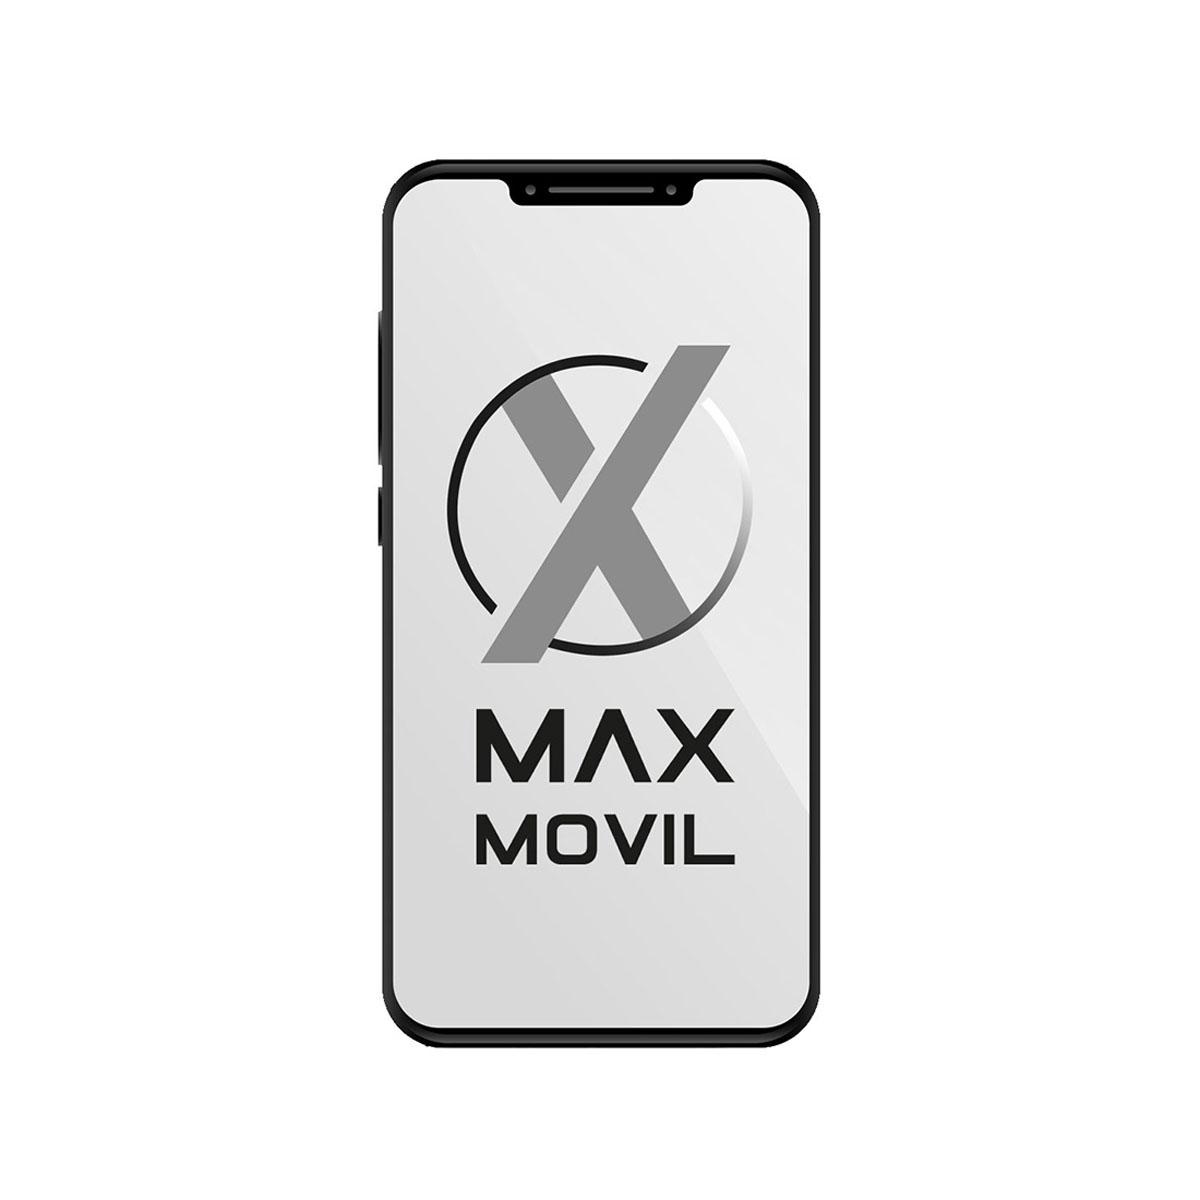 79a5610ec05 Comprar Samsung Galaxy S4 Mini Azul · ENVÍO GRATIS · MaxMovil ⓴⓳